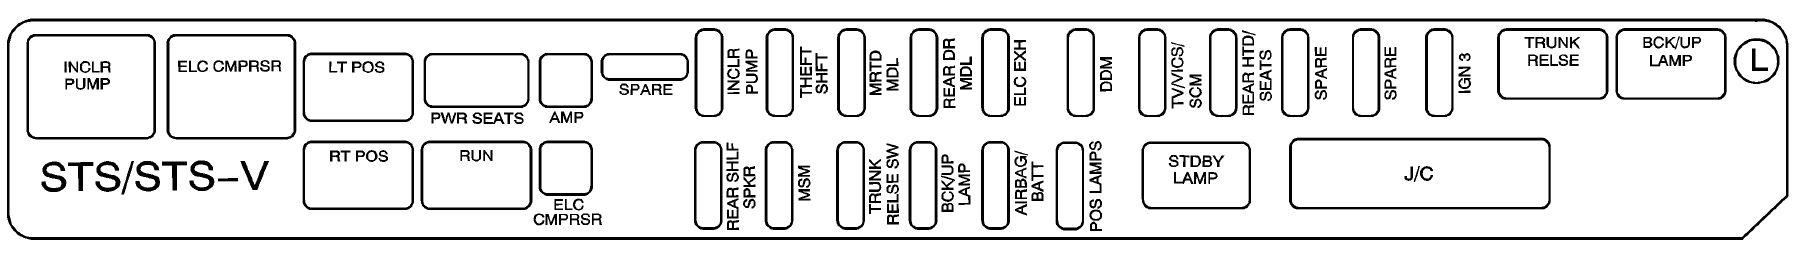 2008 Cadillac Sts Fuse Box Wiring Diagram